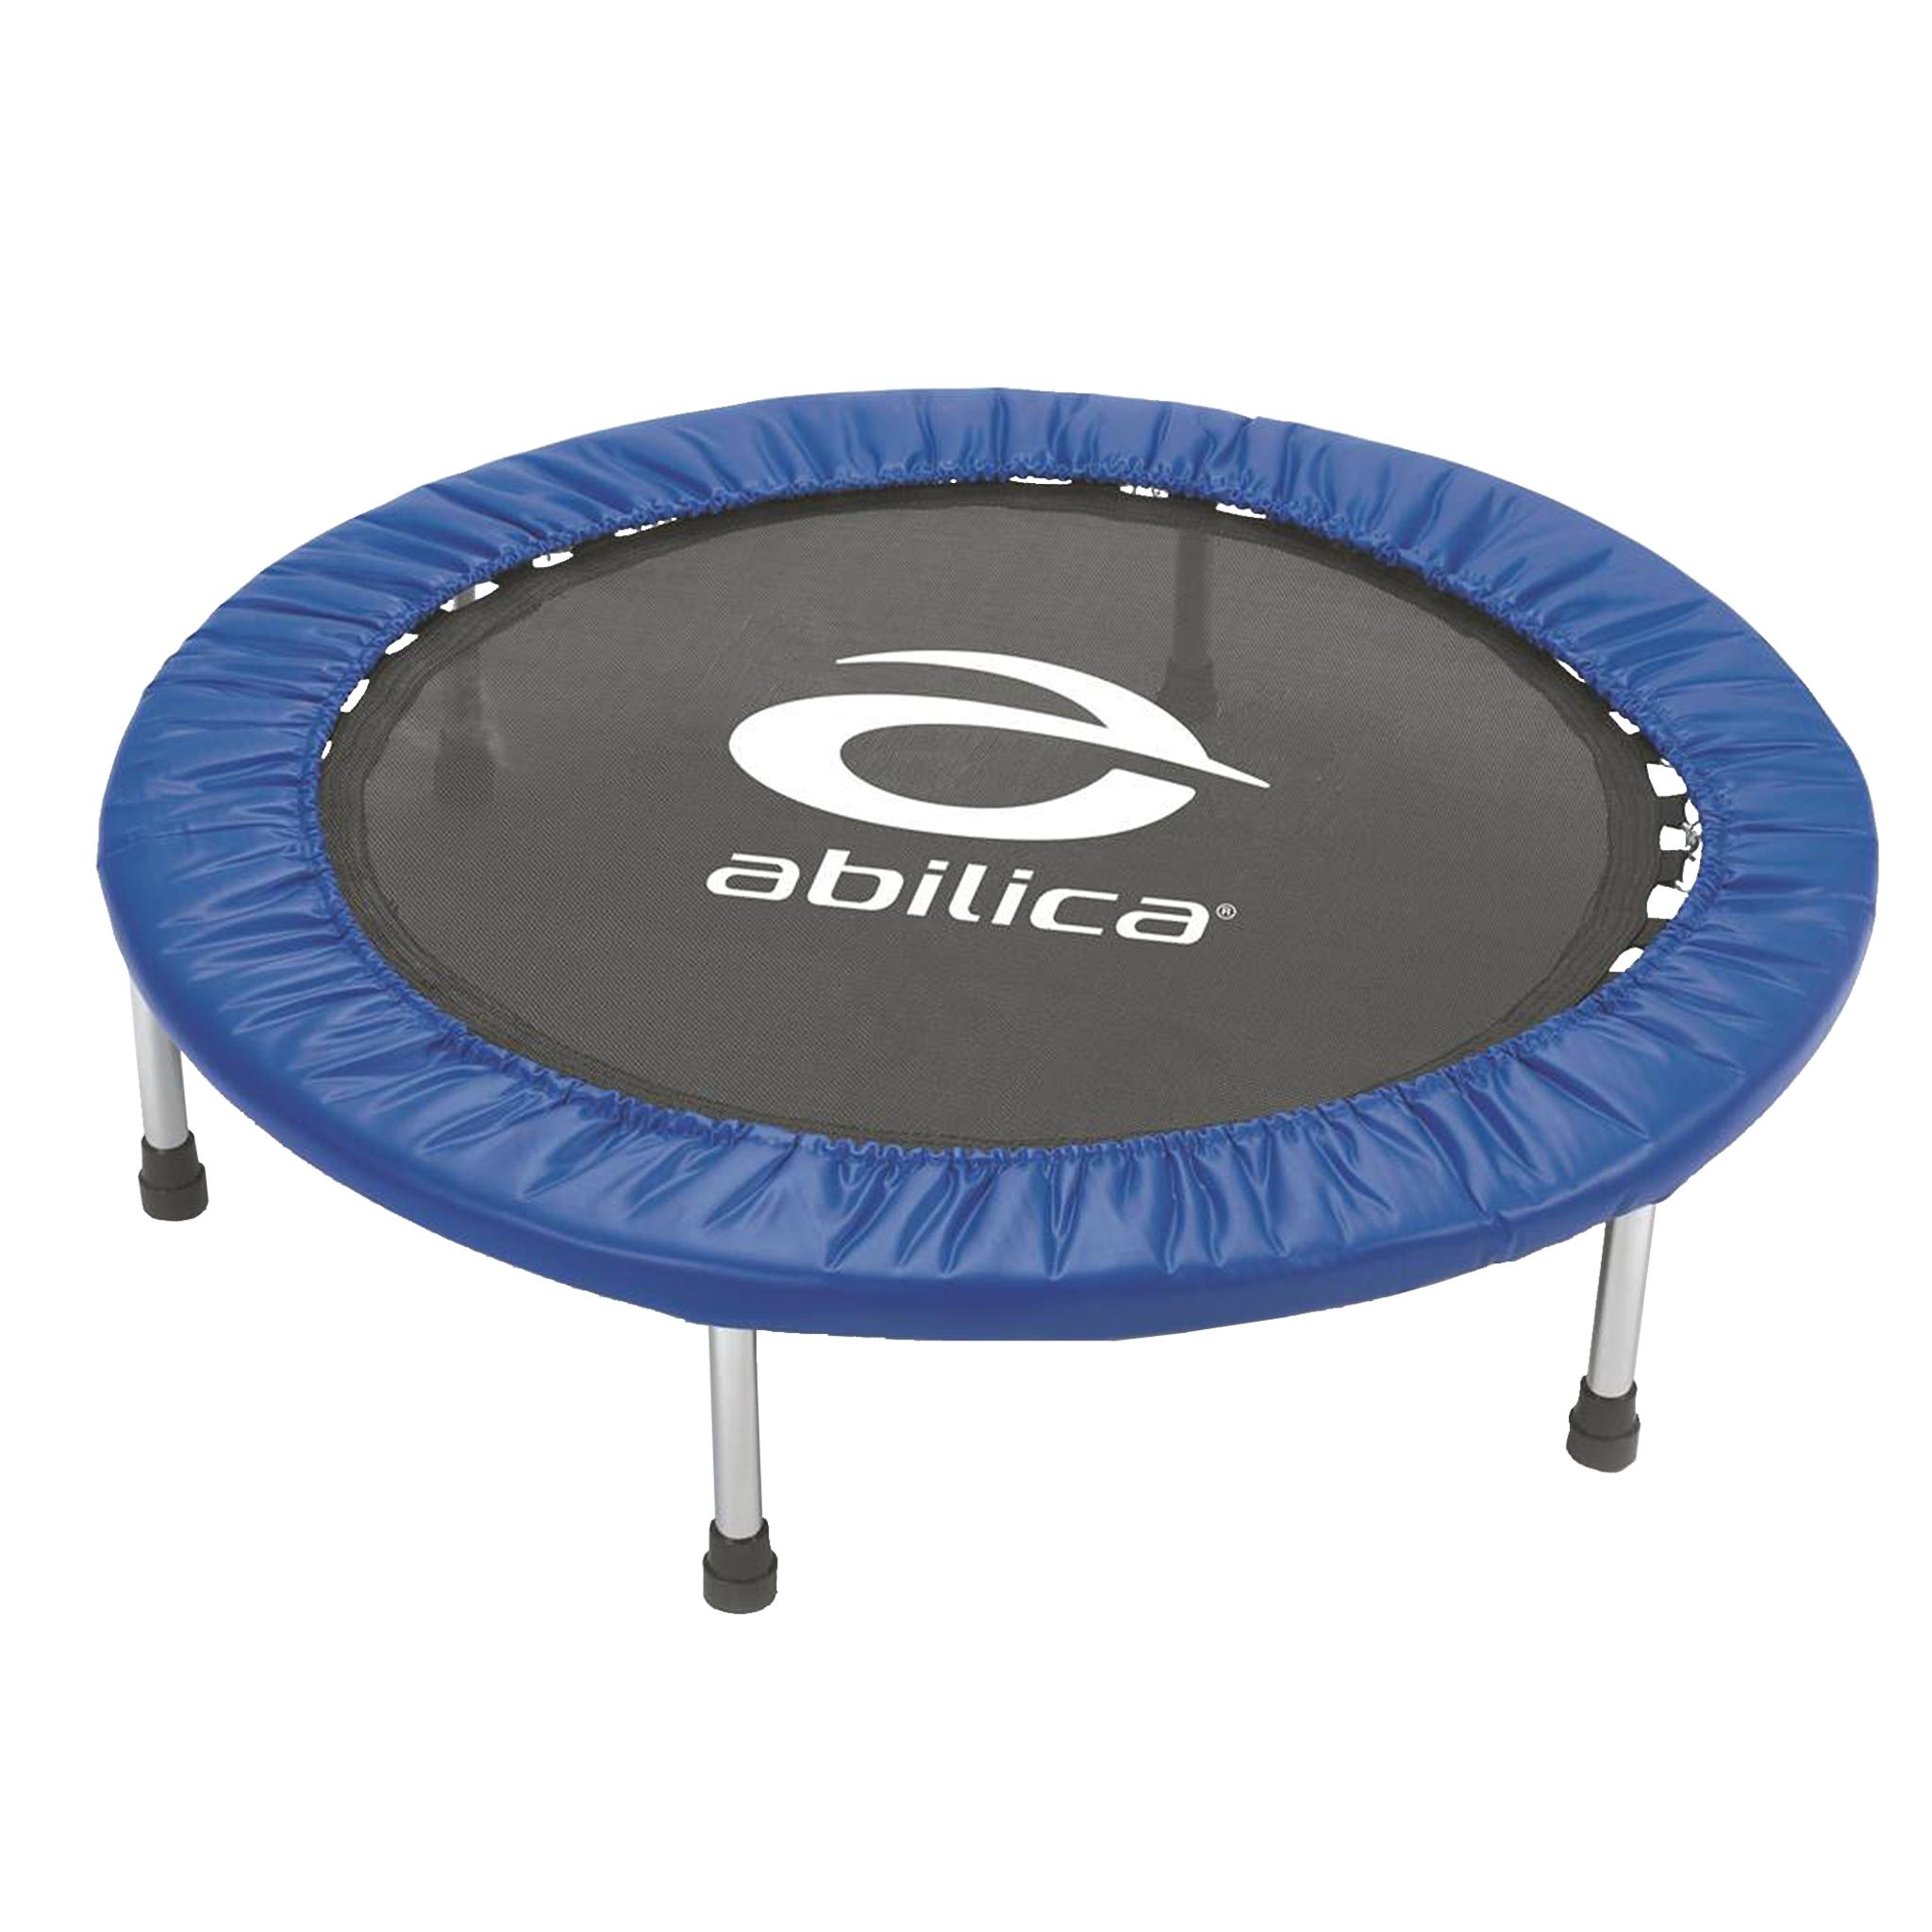 Abilica JumpIt, trampoline STD Black/Blue